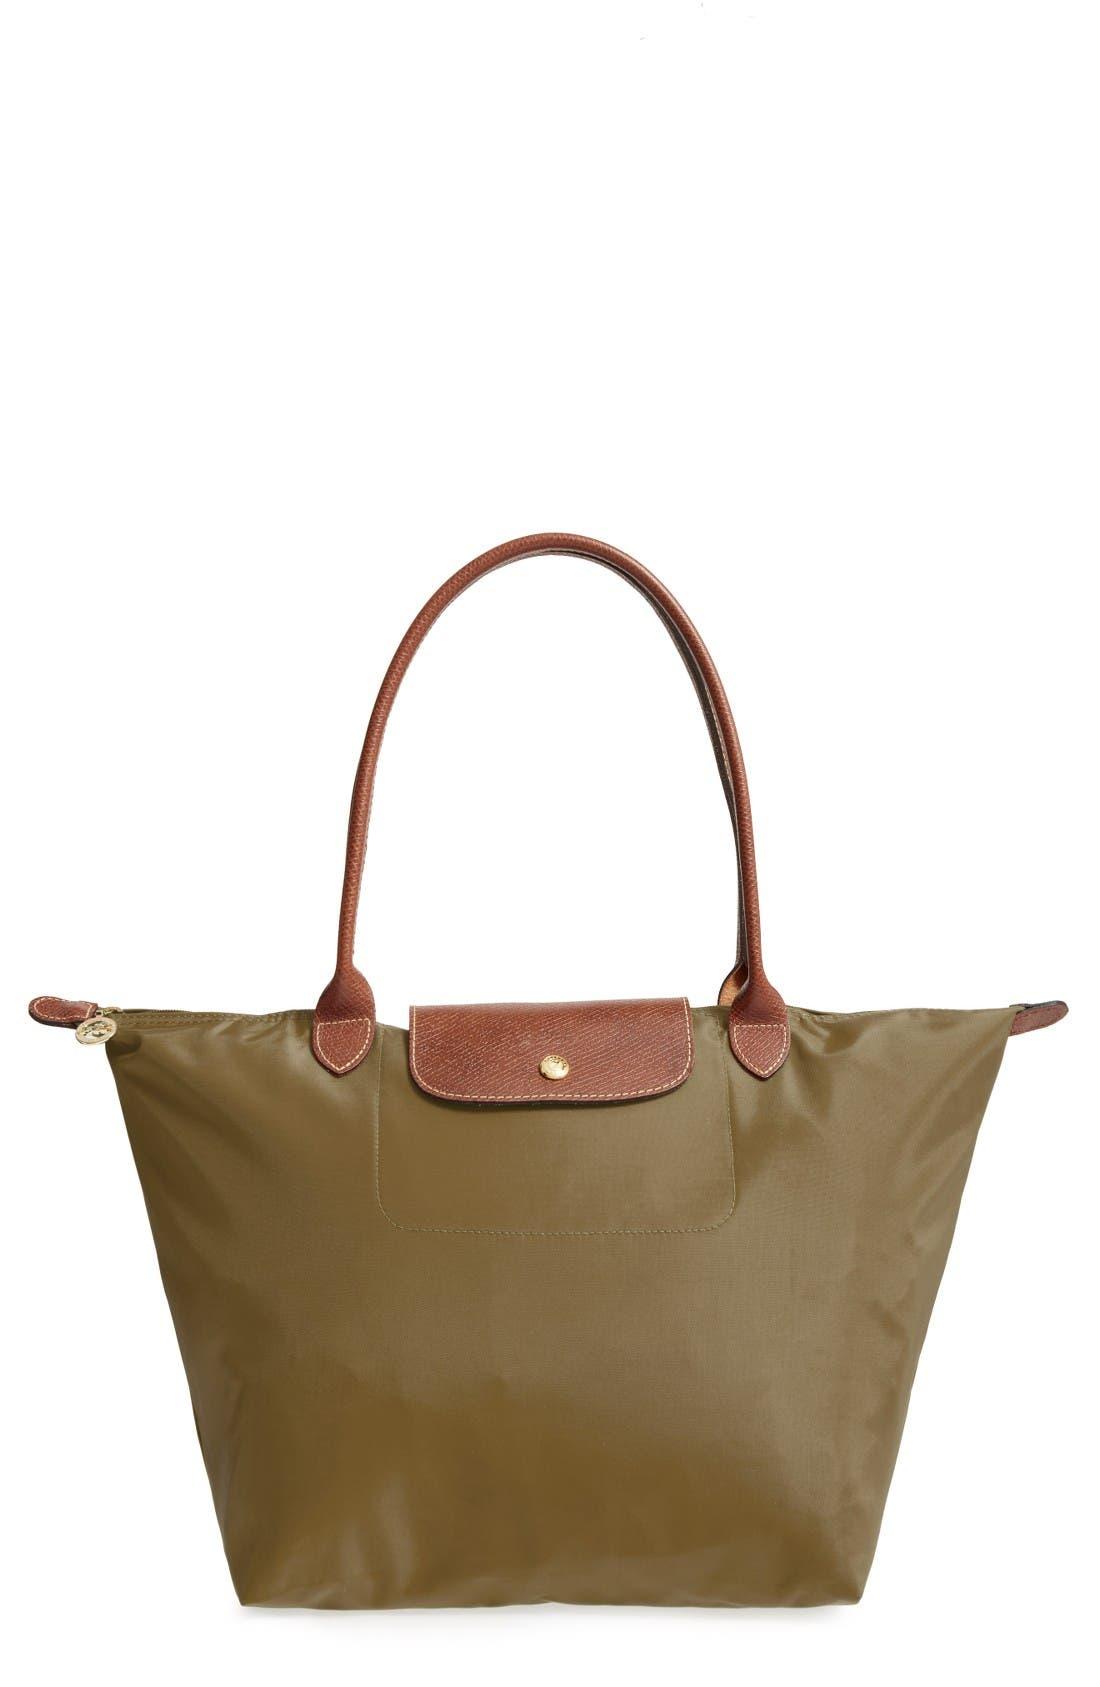 Gifts For Women Part - 46: Longchamp U0027Large Le Pliageu0027 Tote